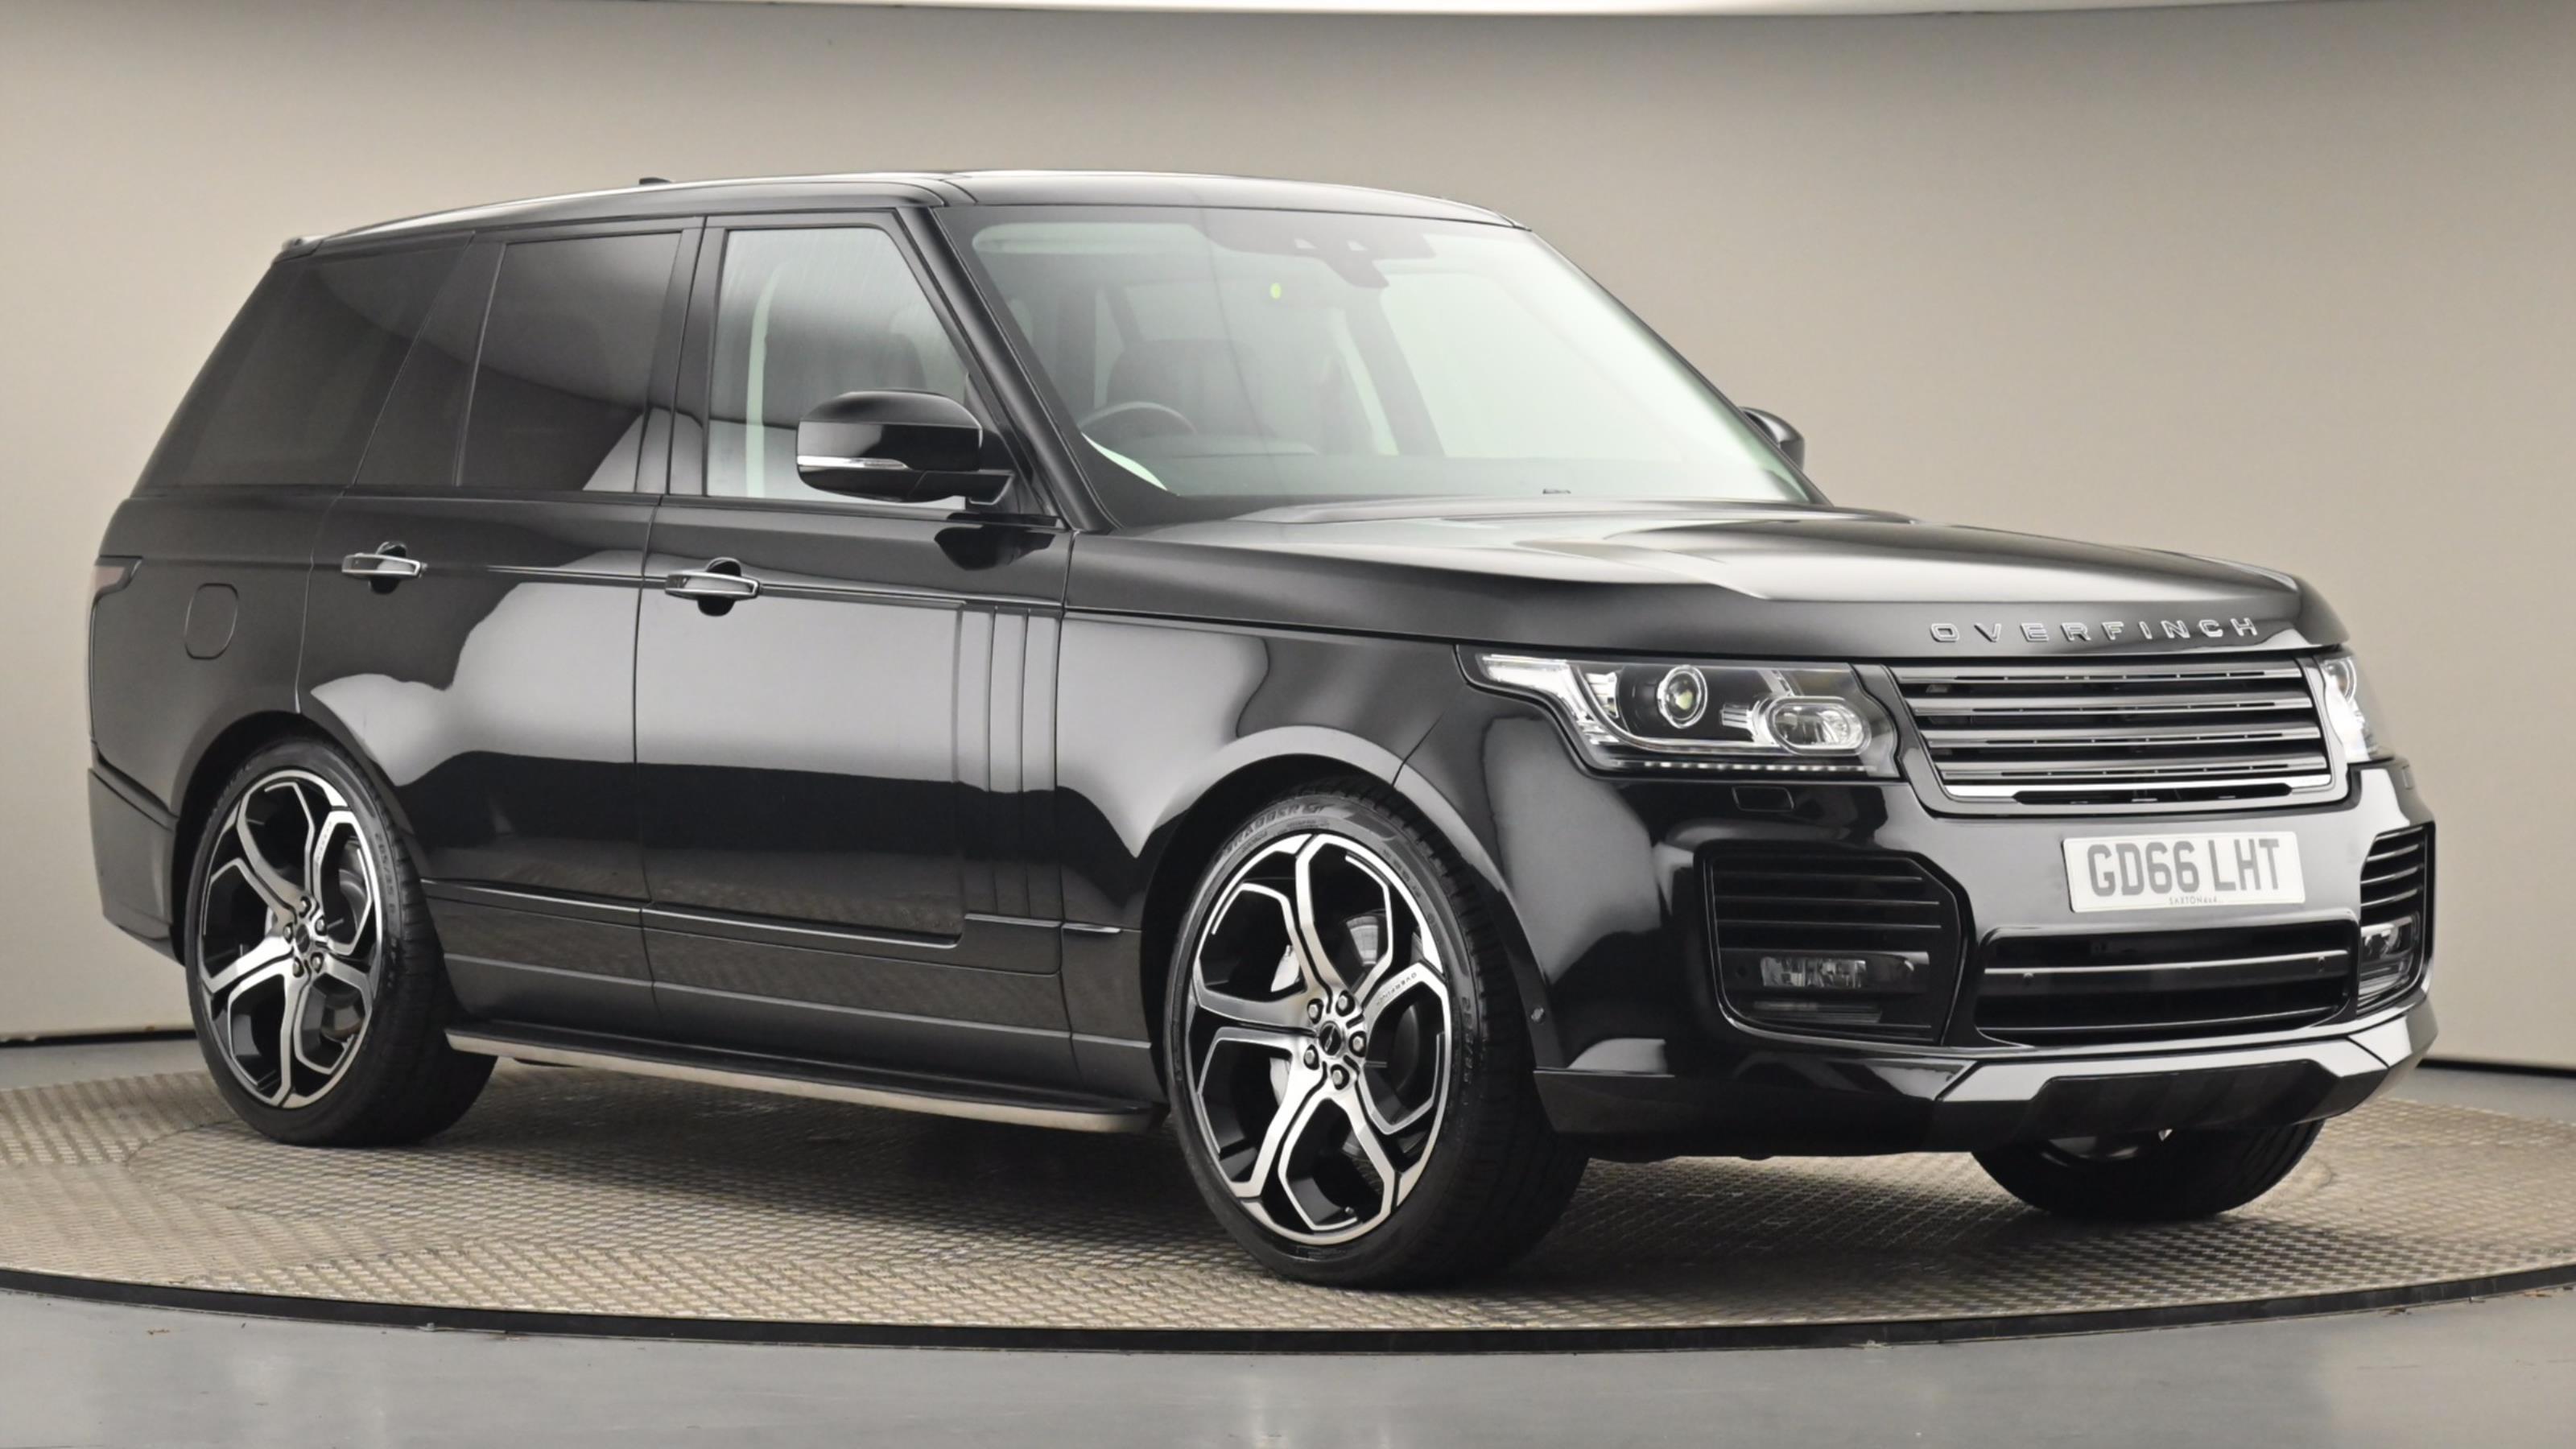 Used 2017 Land Rover RANGE ROVER 4.4 SDV8 Vogue SE 4dr Auto BLACK at Saxton4x4